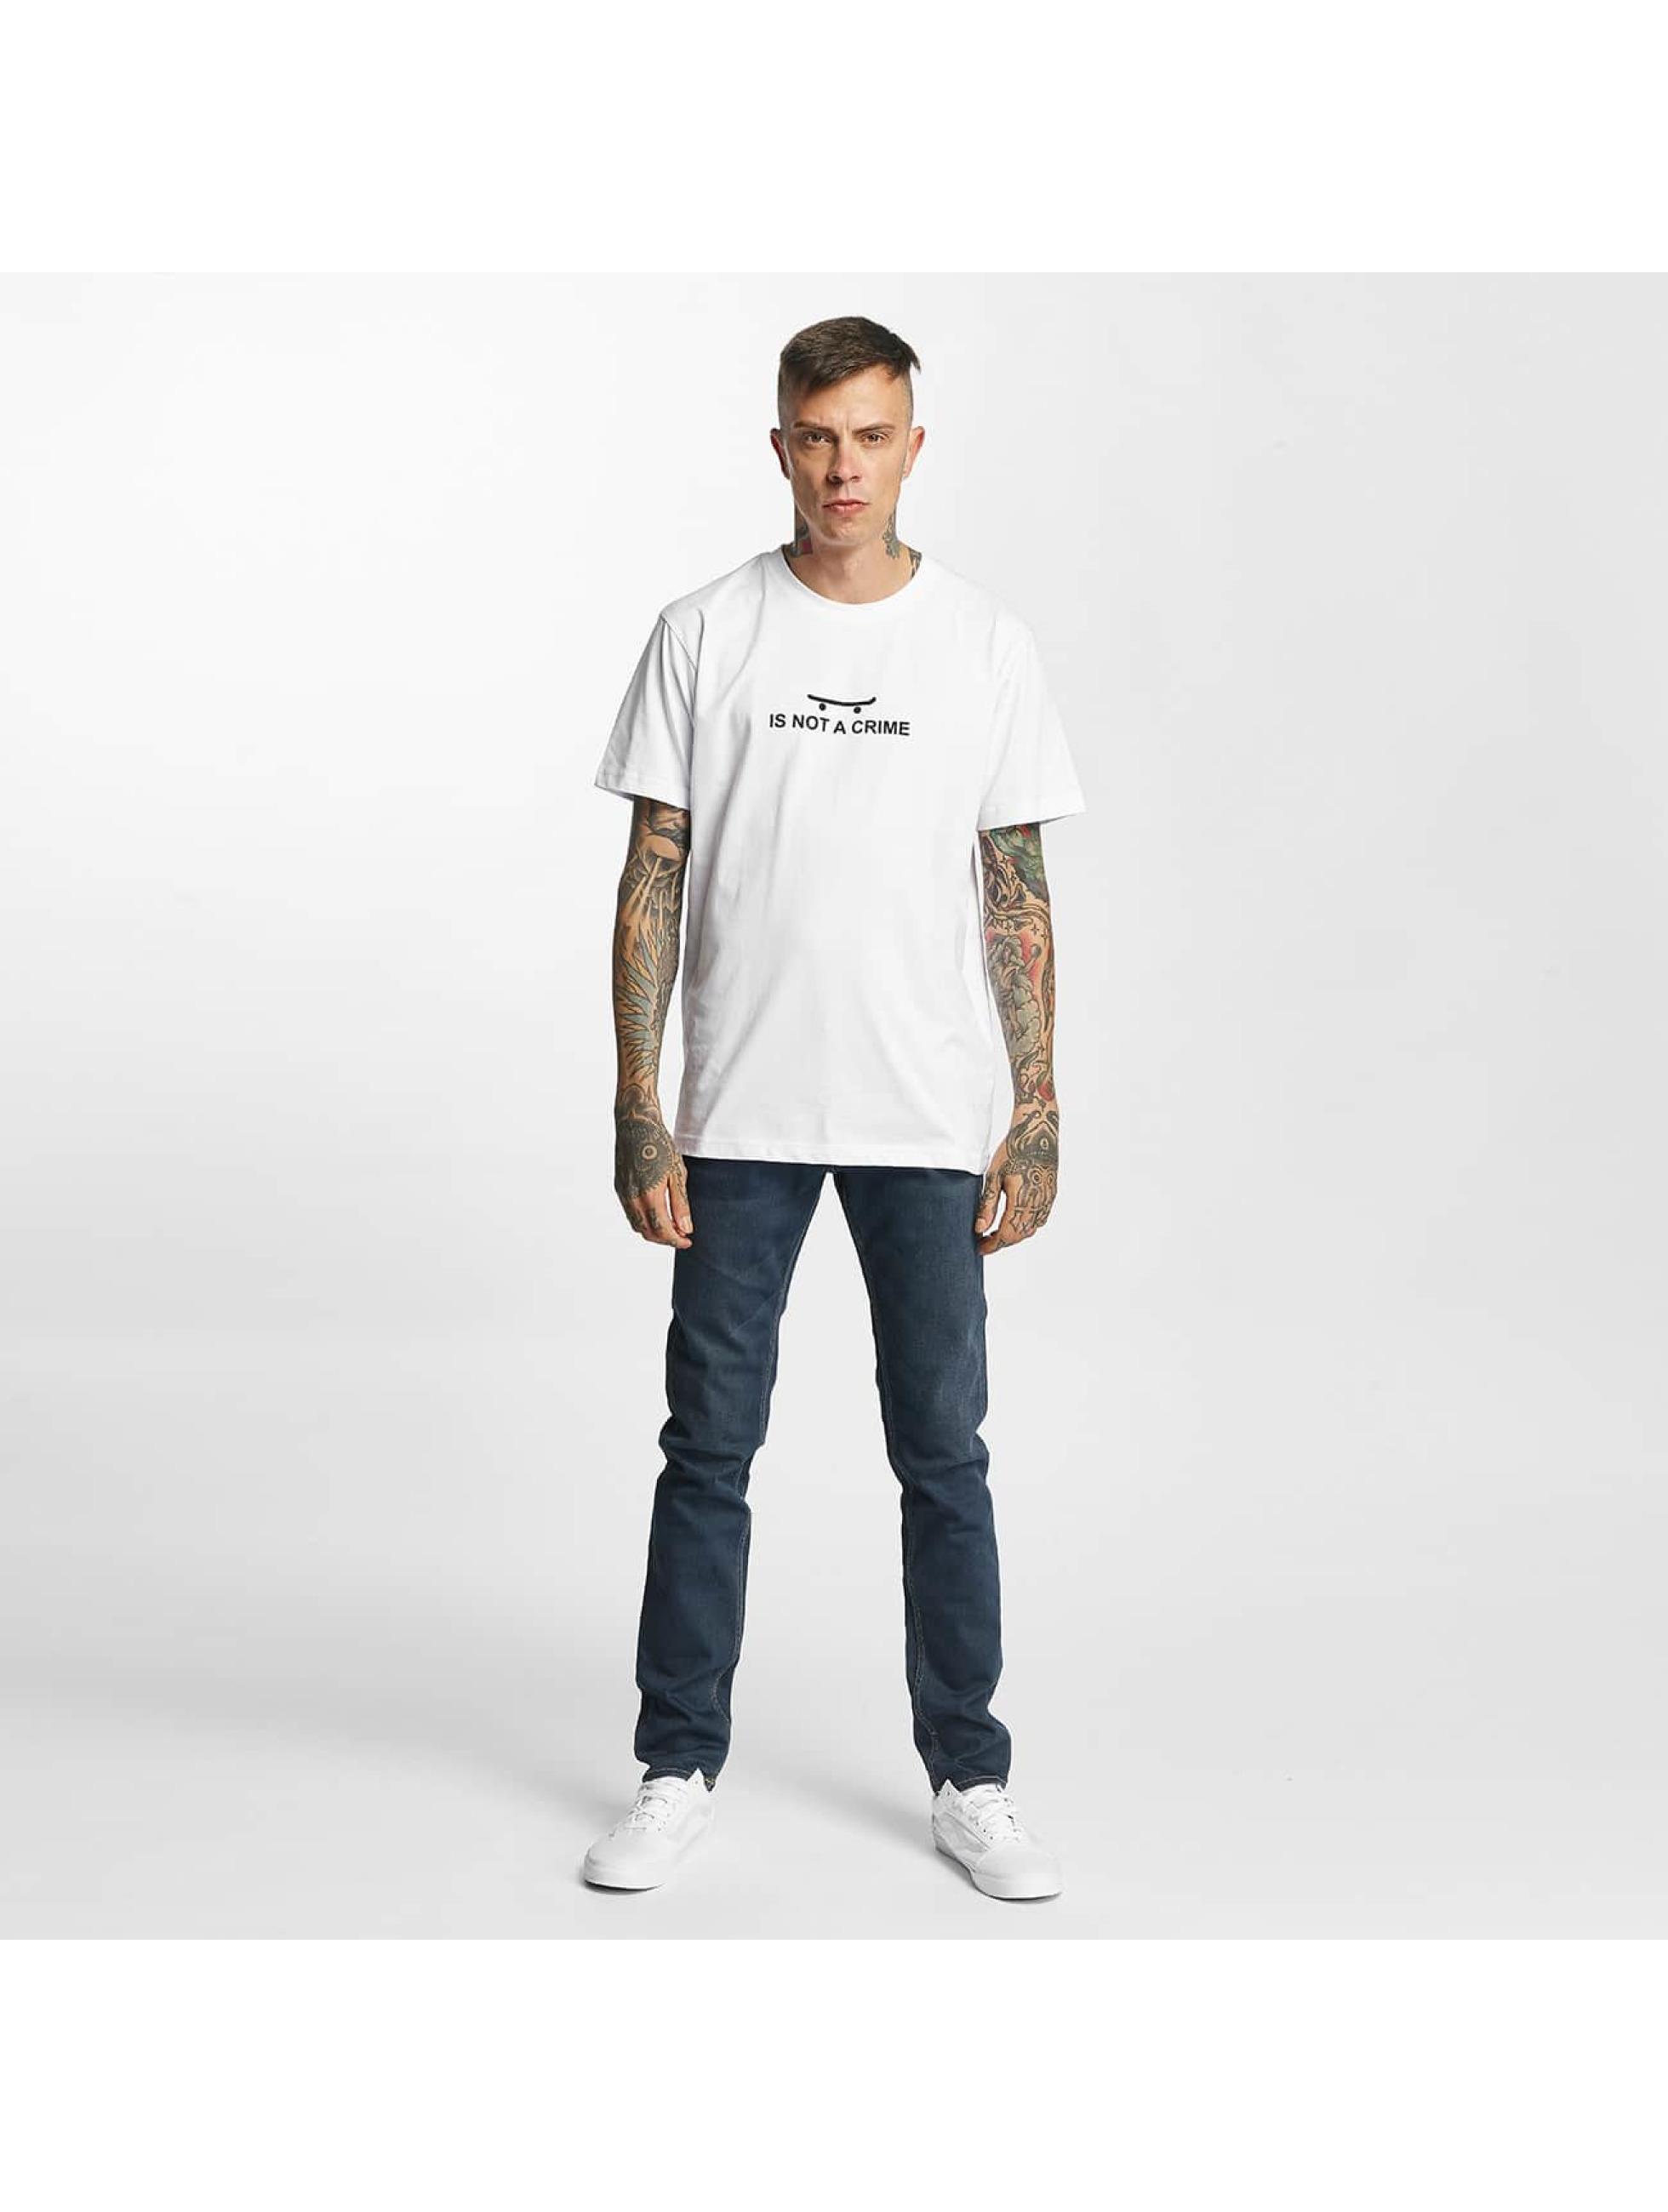 Mister Tee T-Shirt Not A Crime white